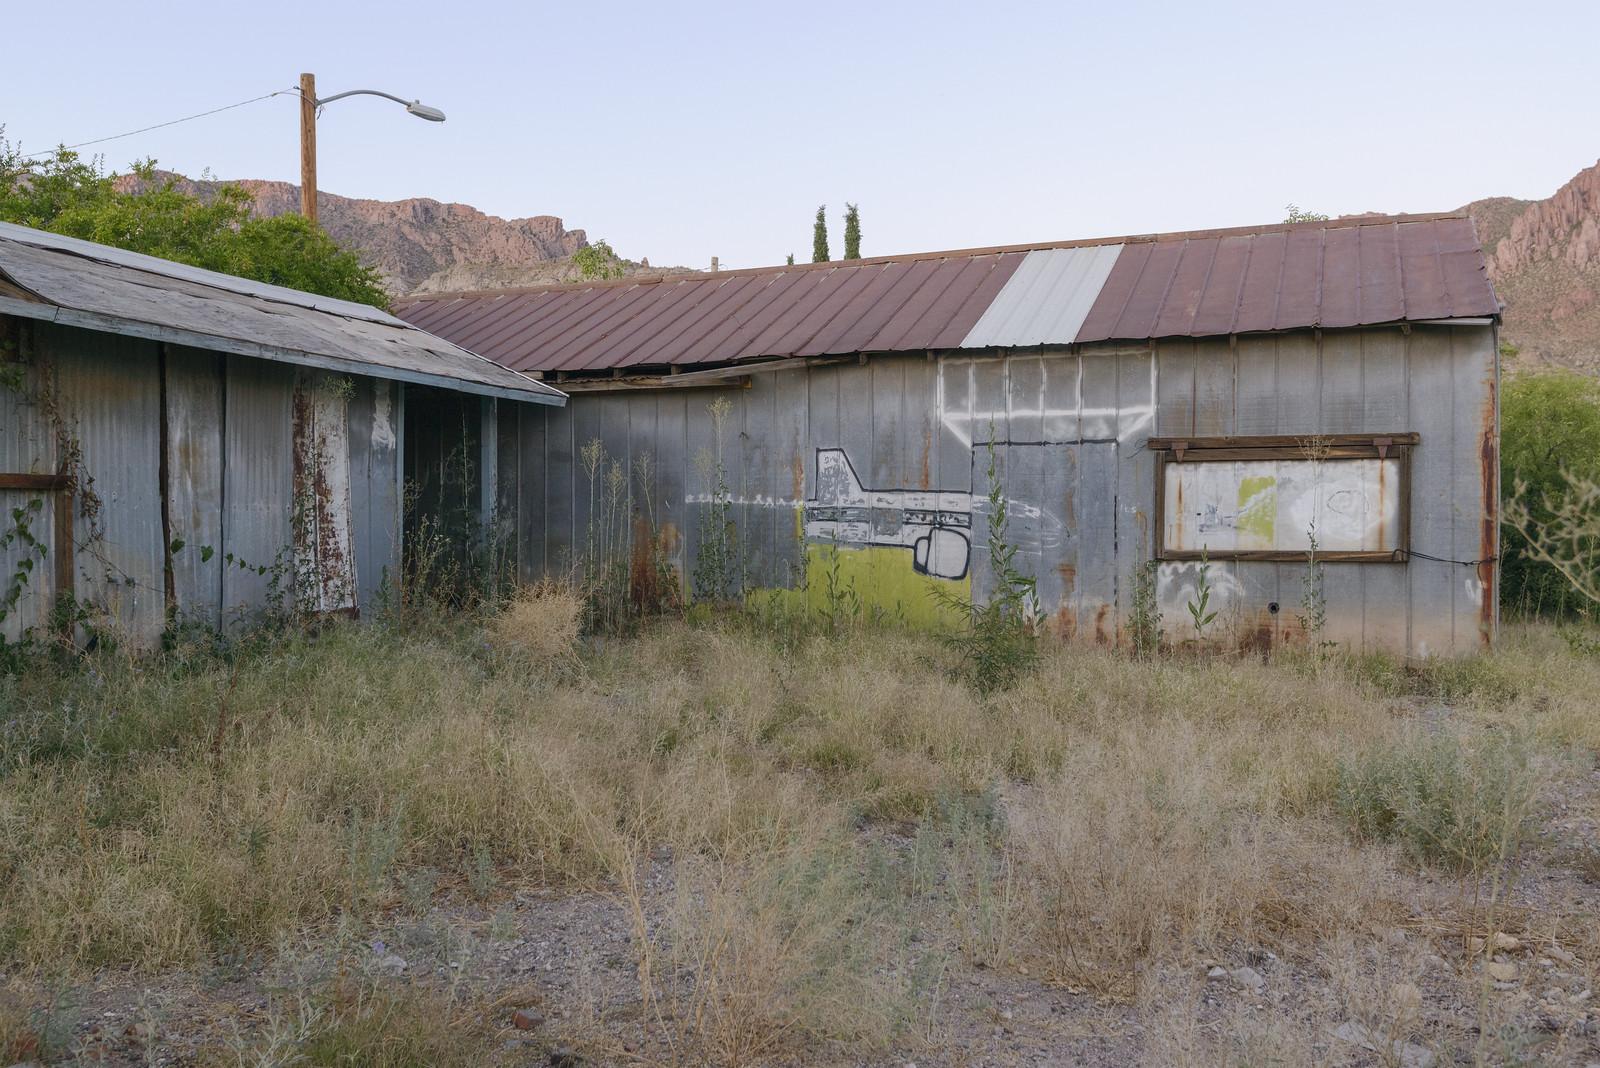 Superior, Arizona; no. 2; 2017   by GC_Dean